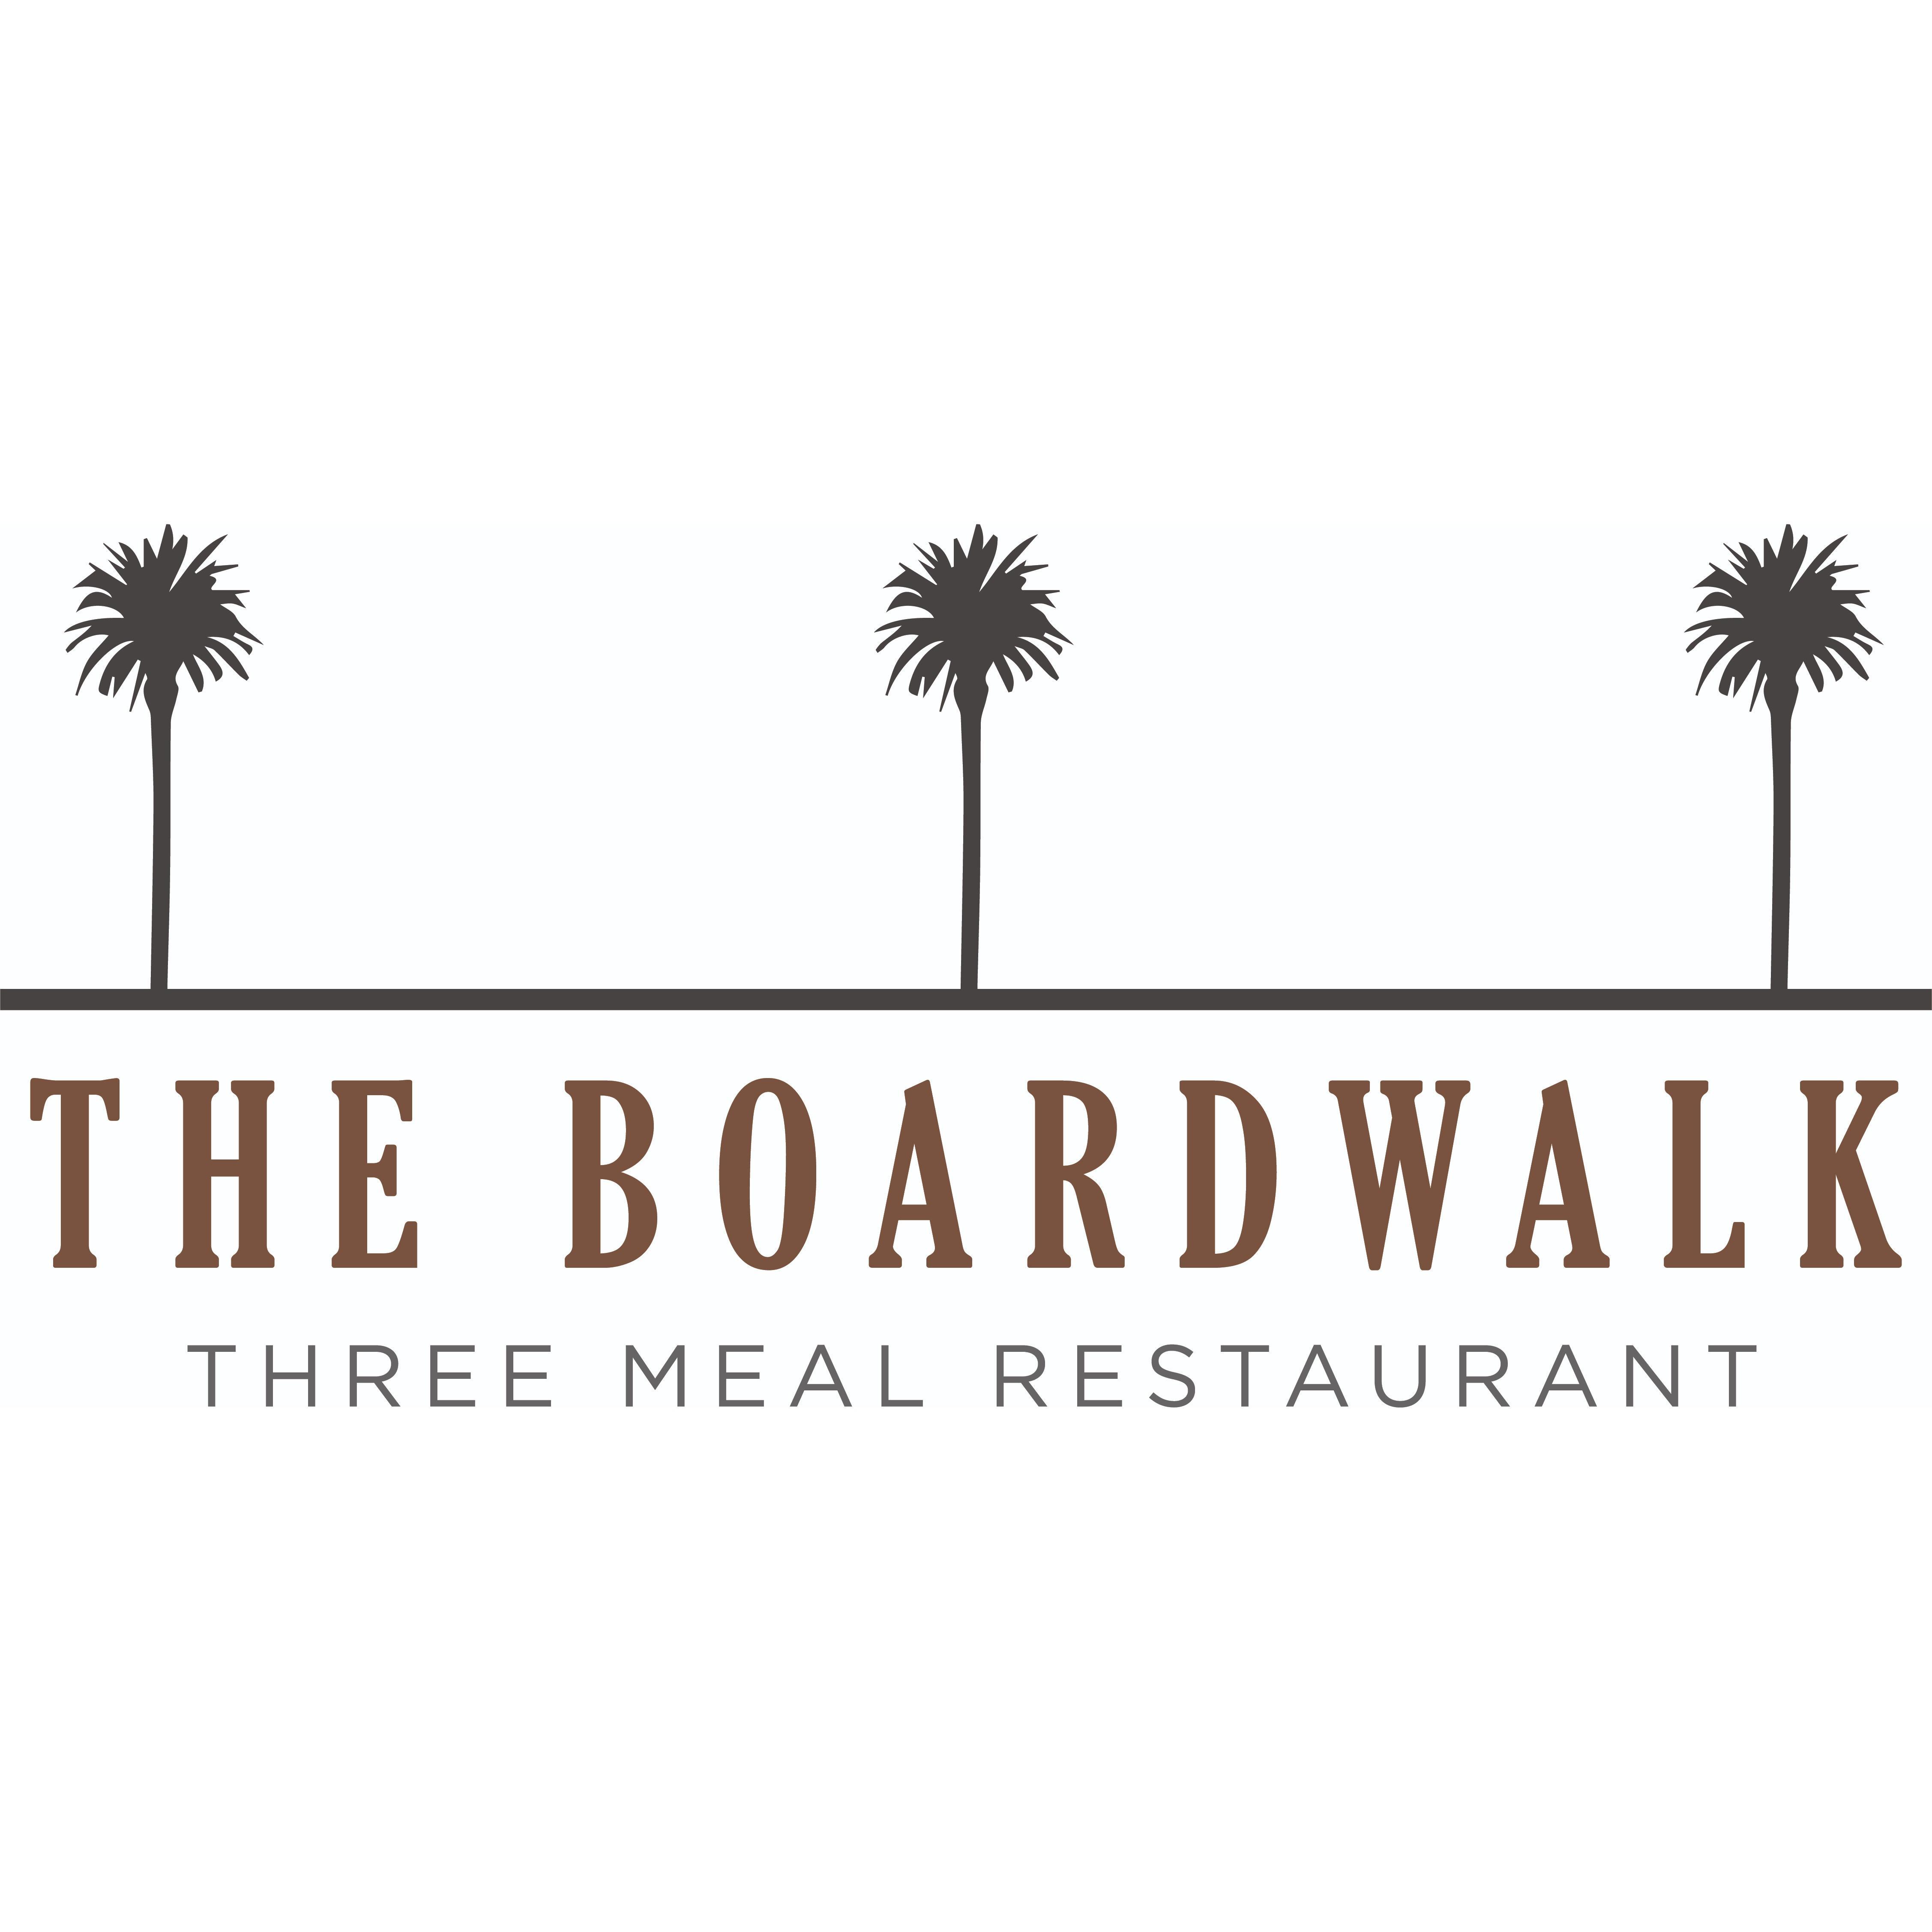 The Boardwalk Restaurant